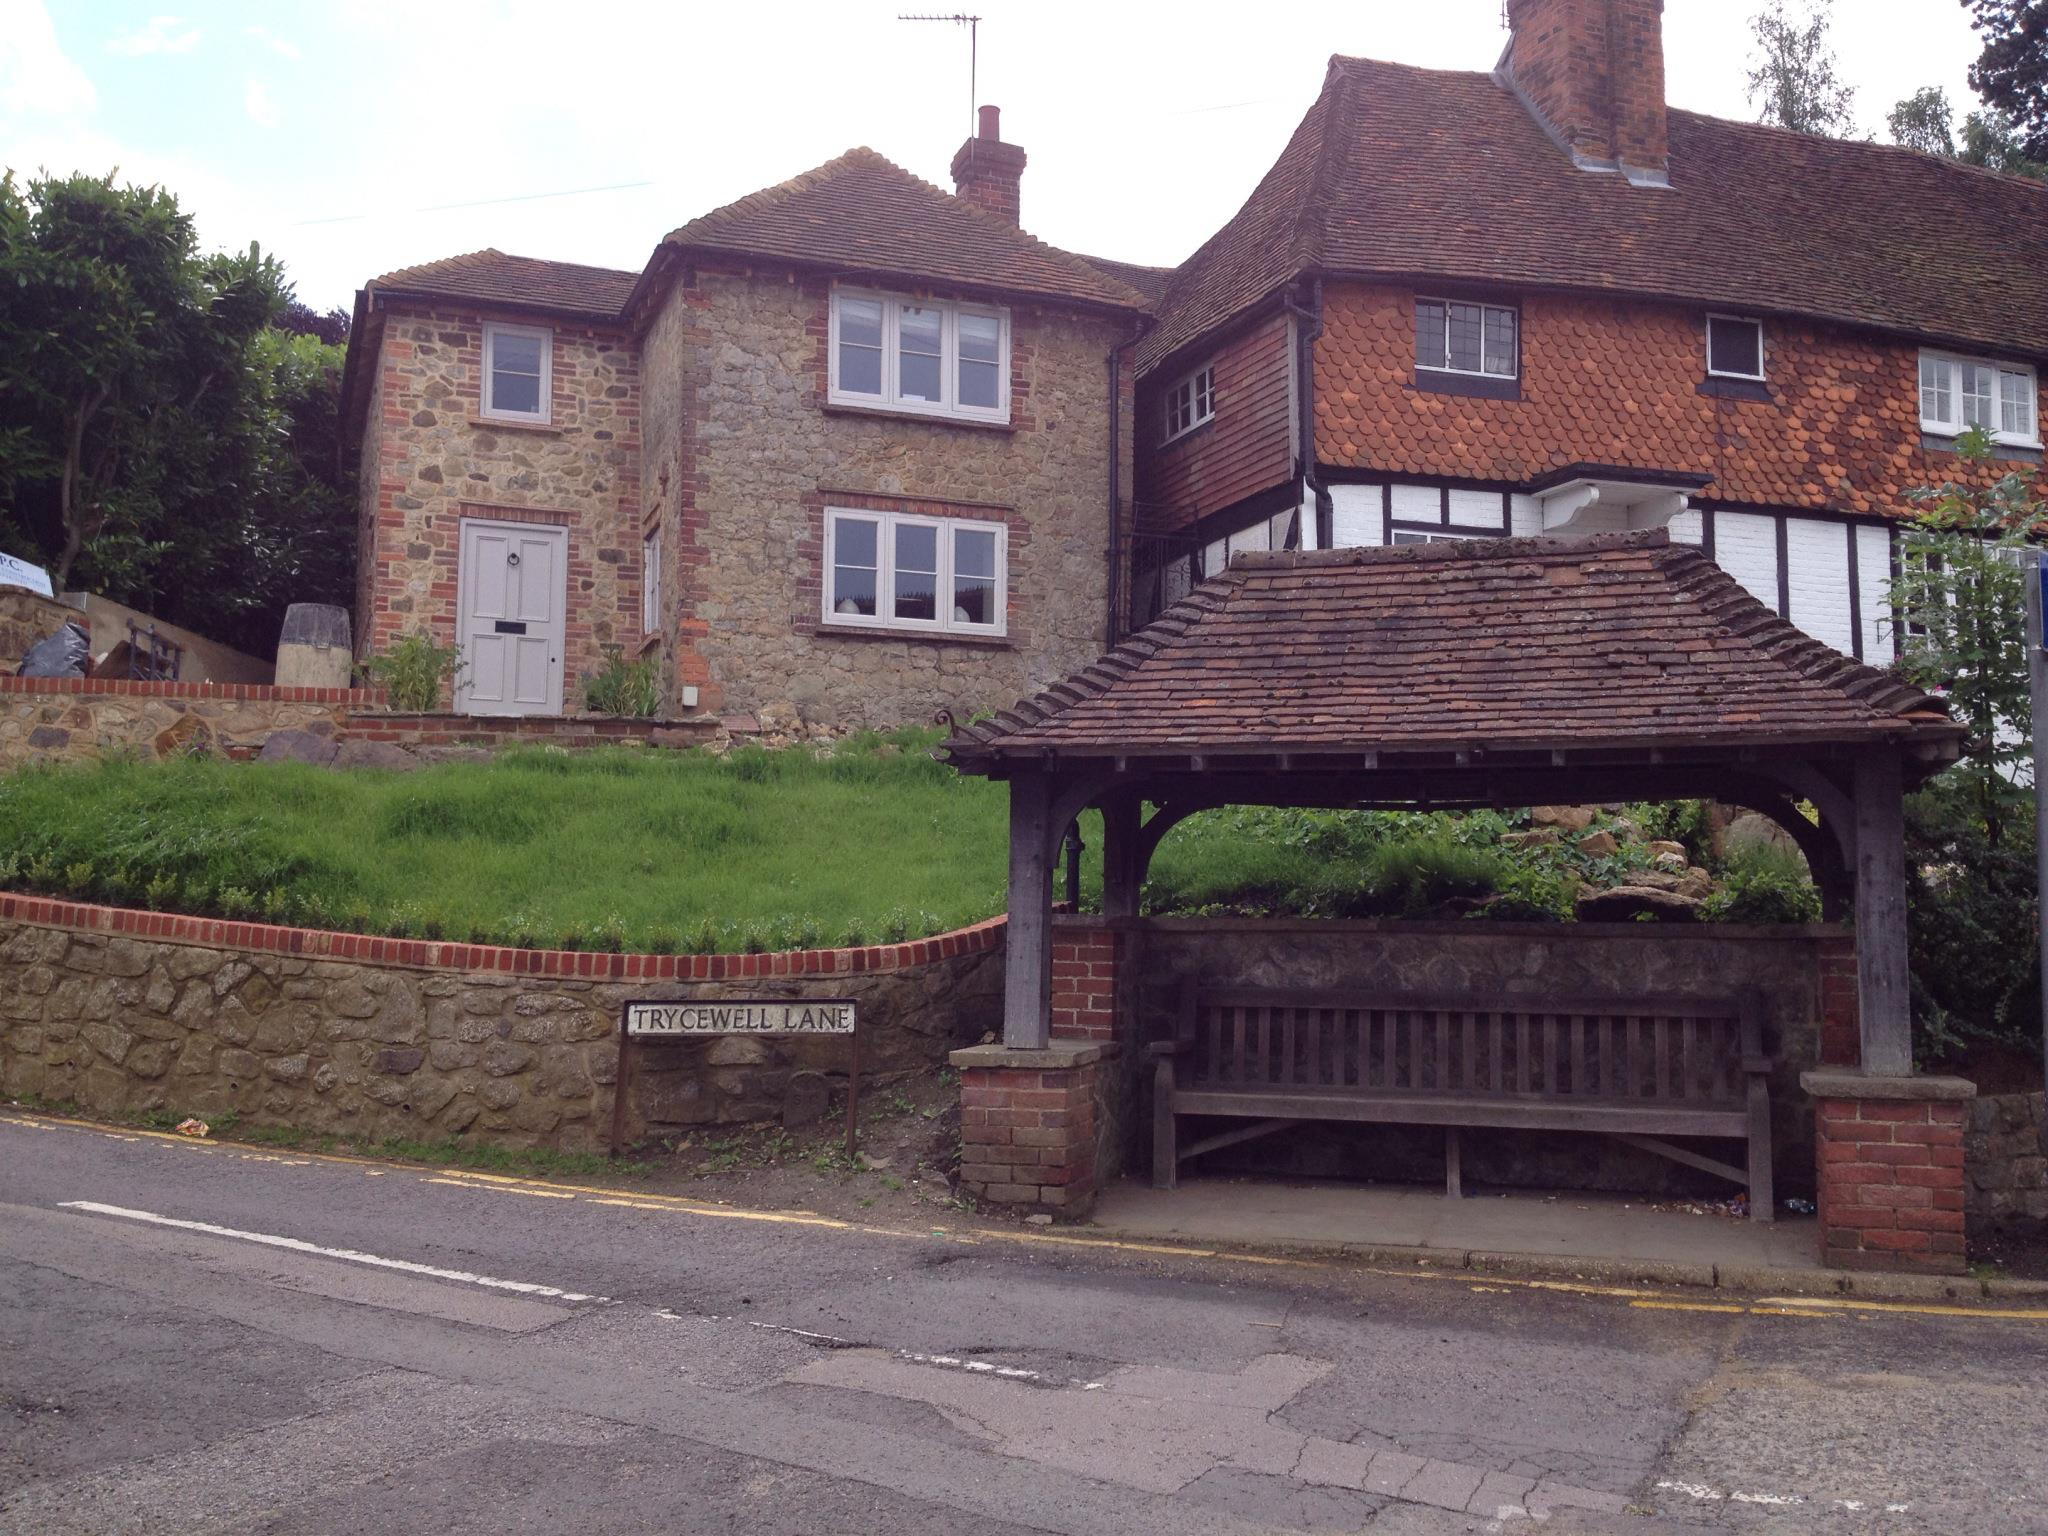 Trycewell Lane, Ightham